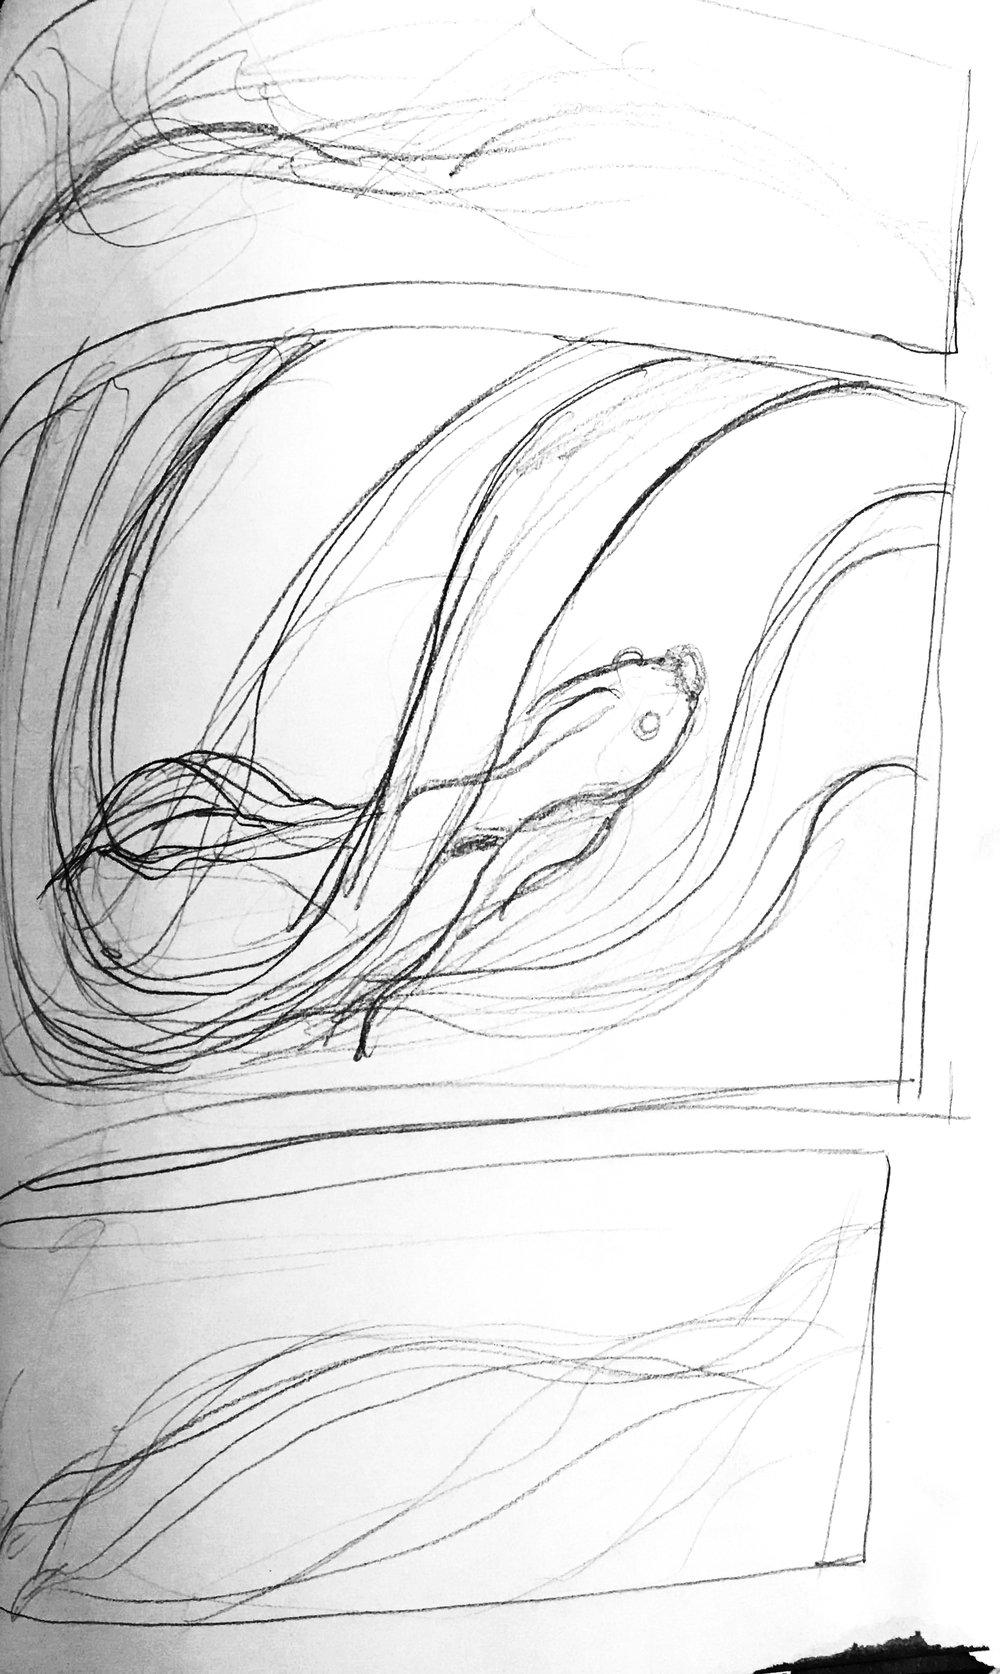 Sketch-Seascape-3.jpg